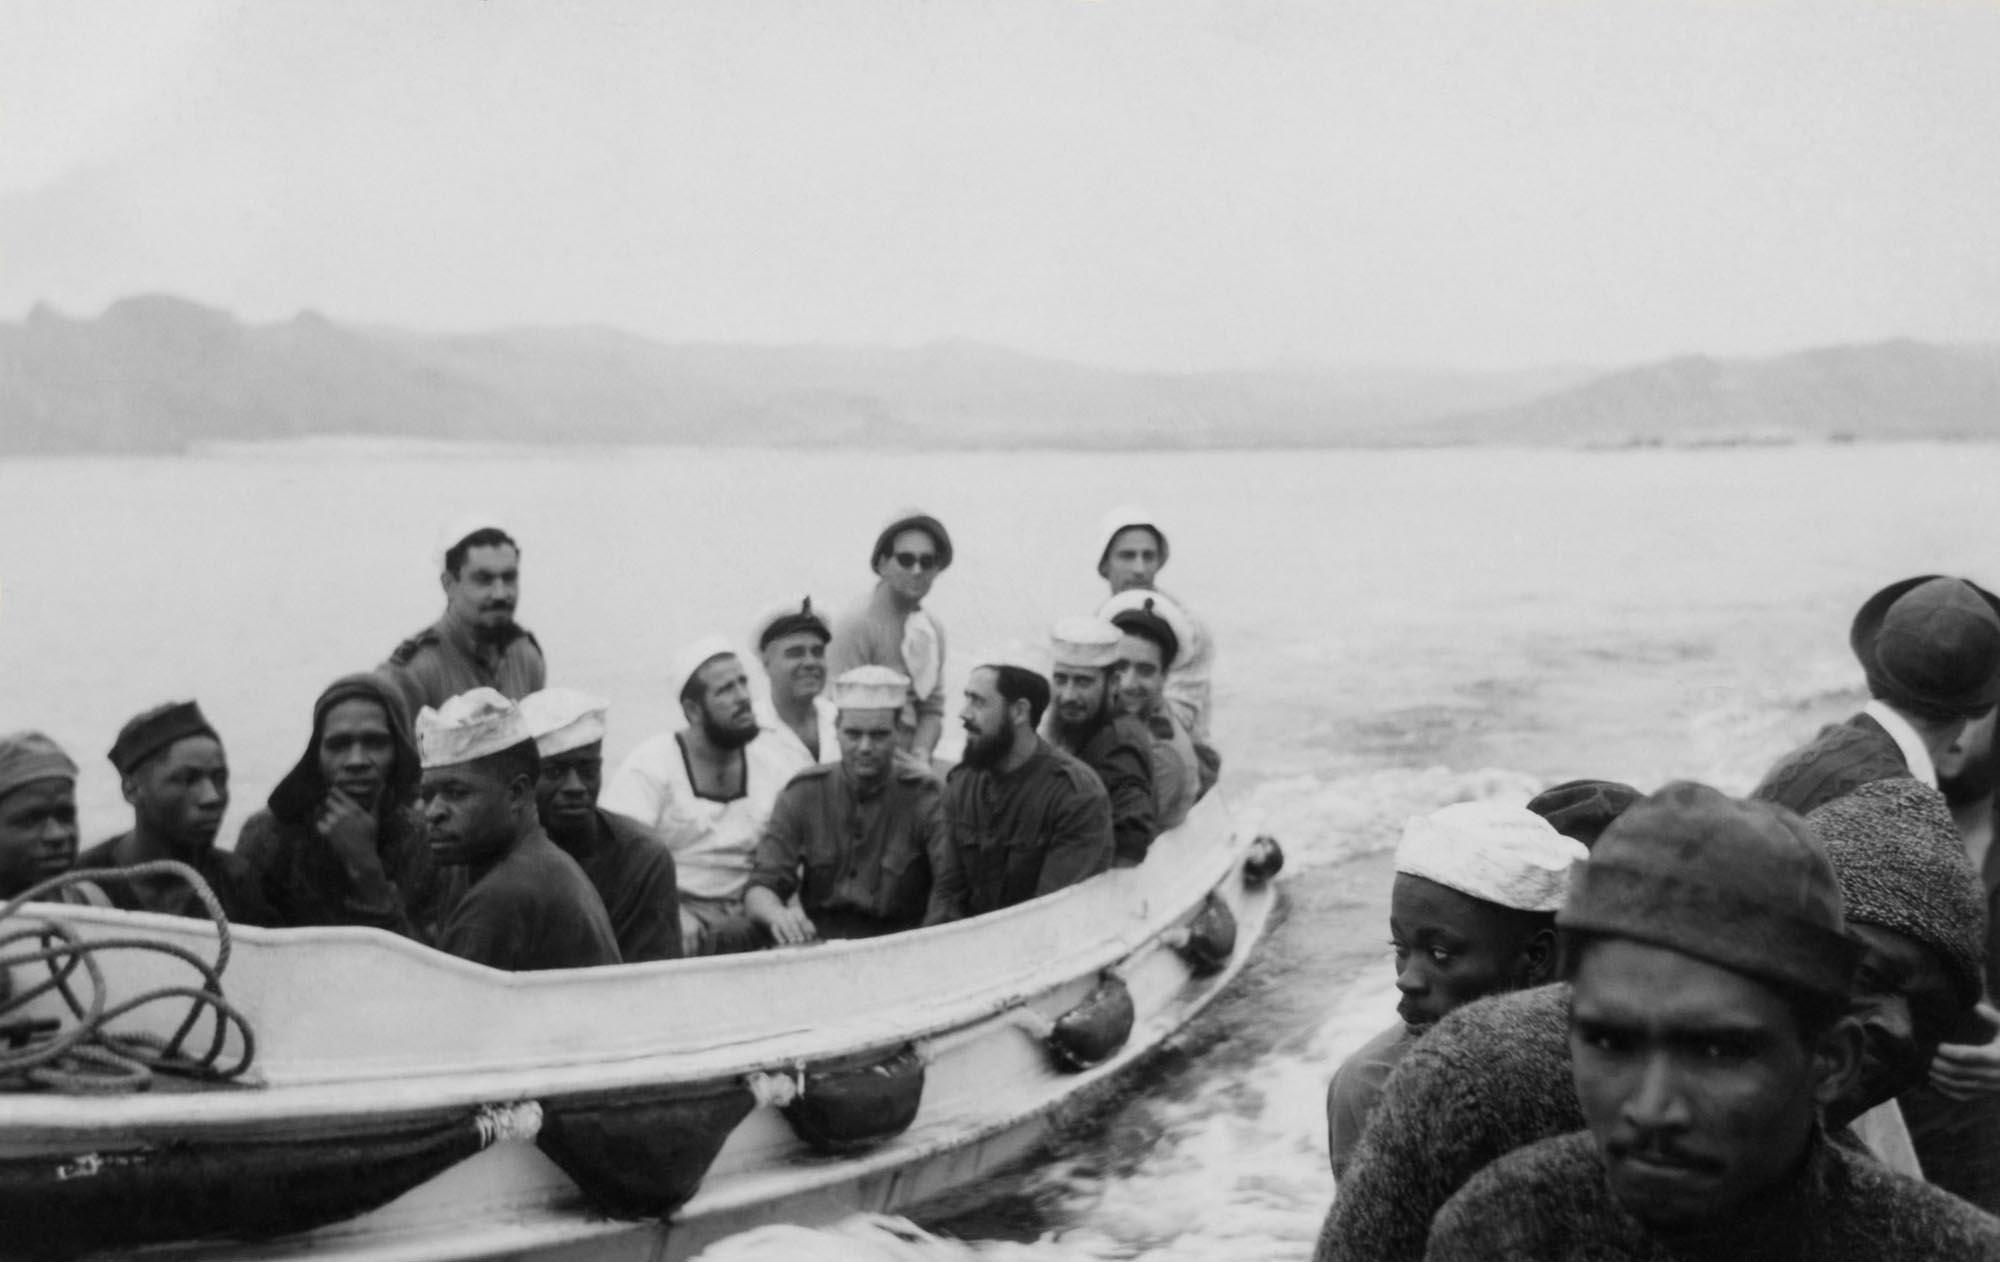 Men in Boats - circa 1960's